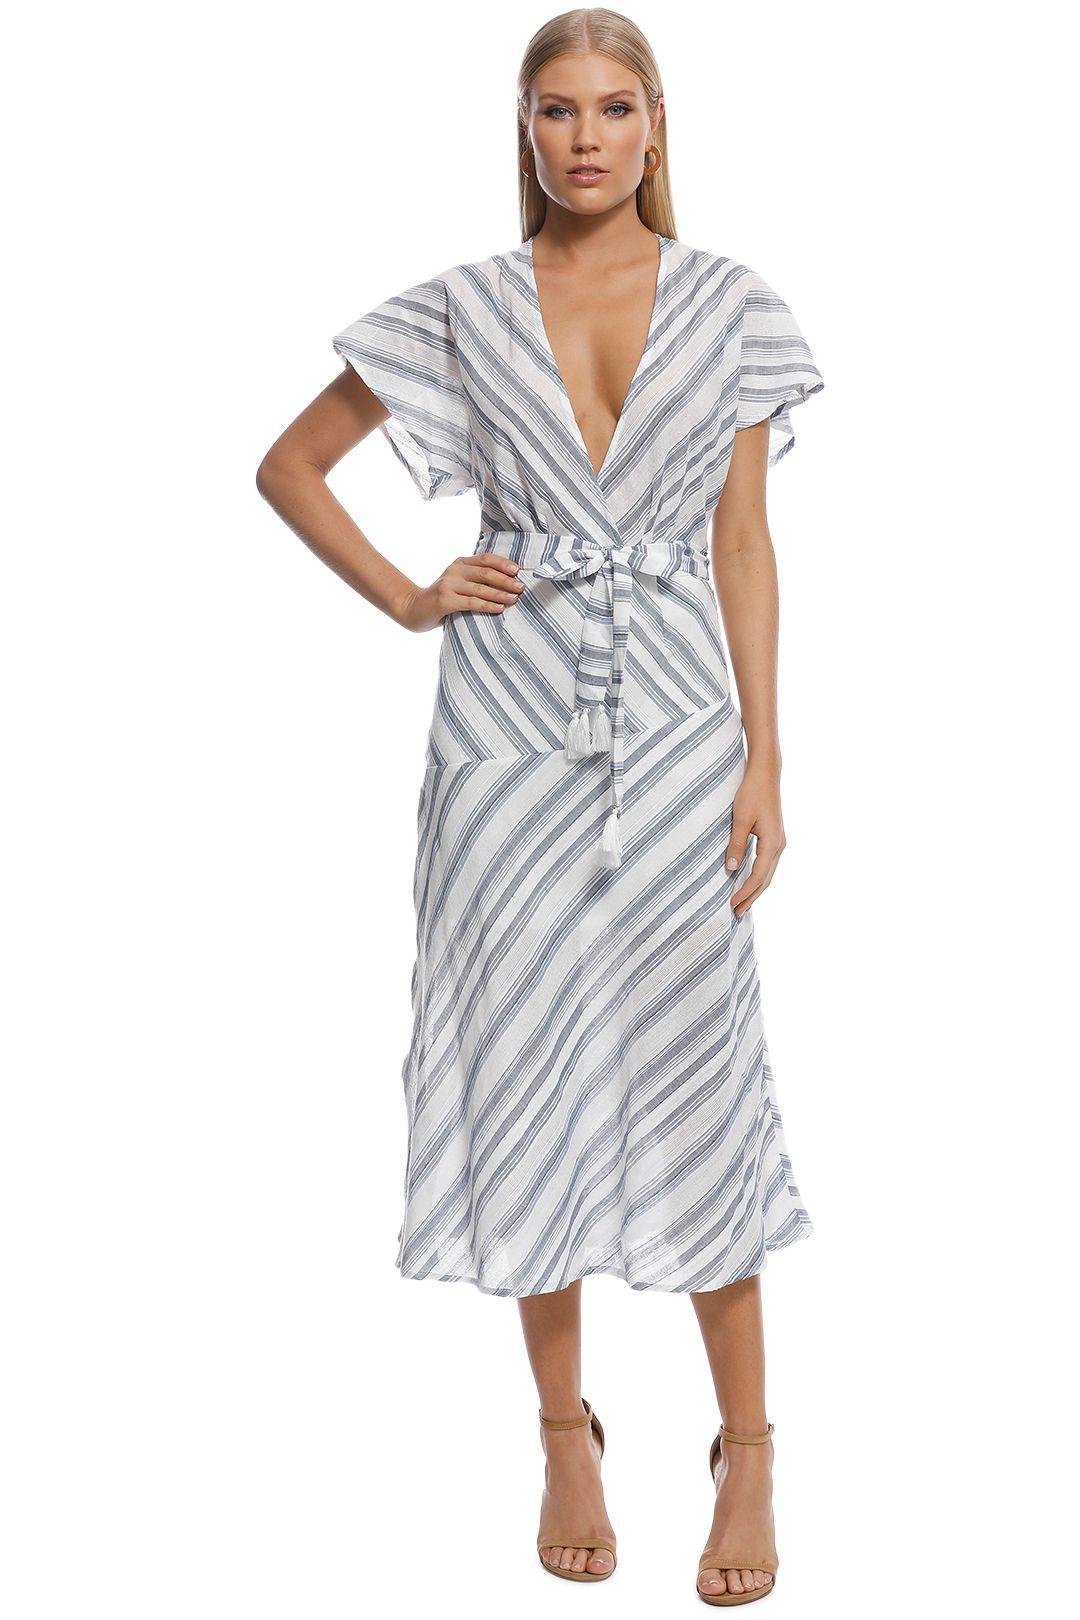 Suboo - Shoreline Midi Dress - Blue White - Front